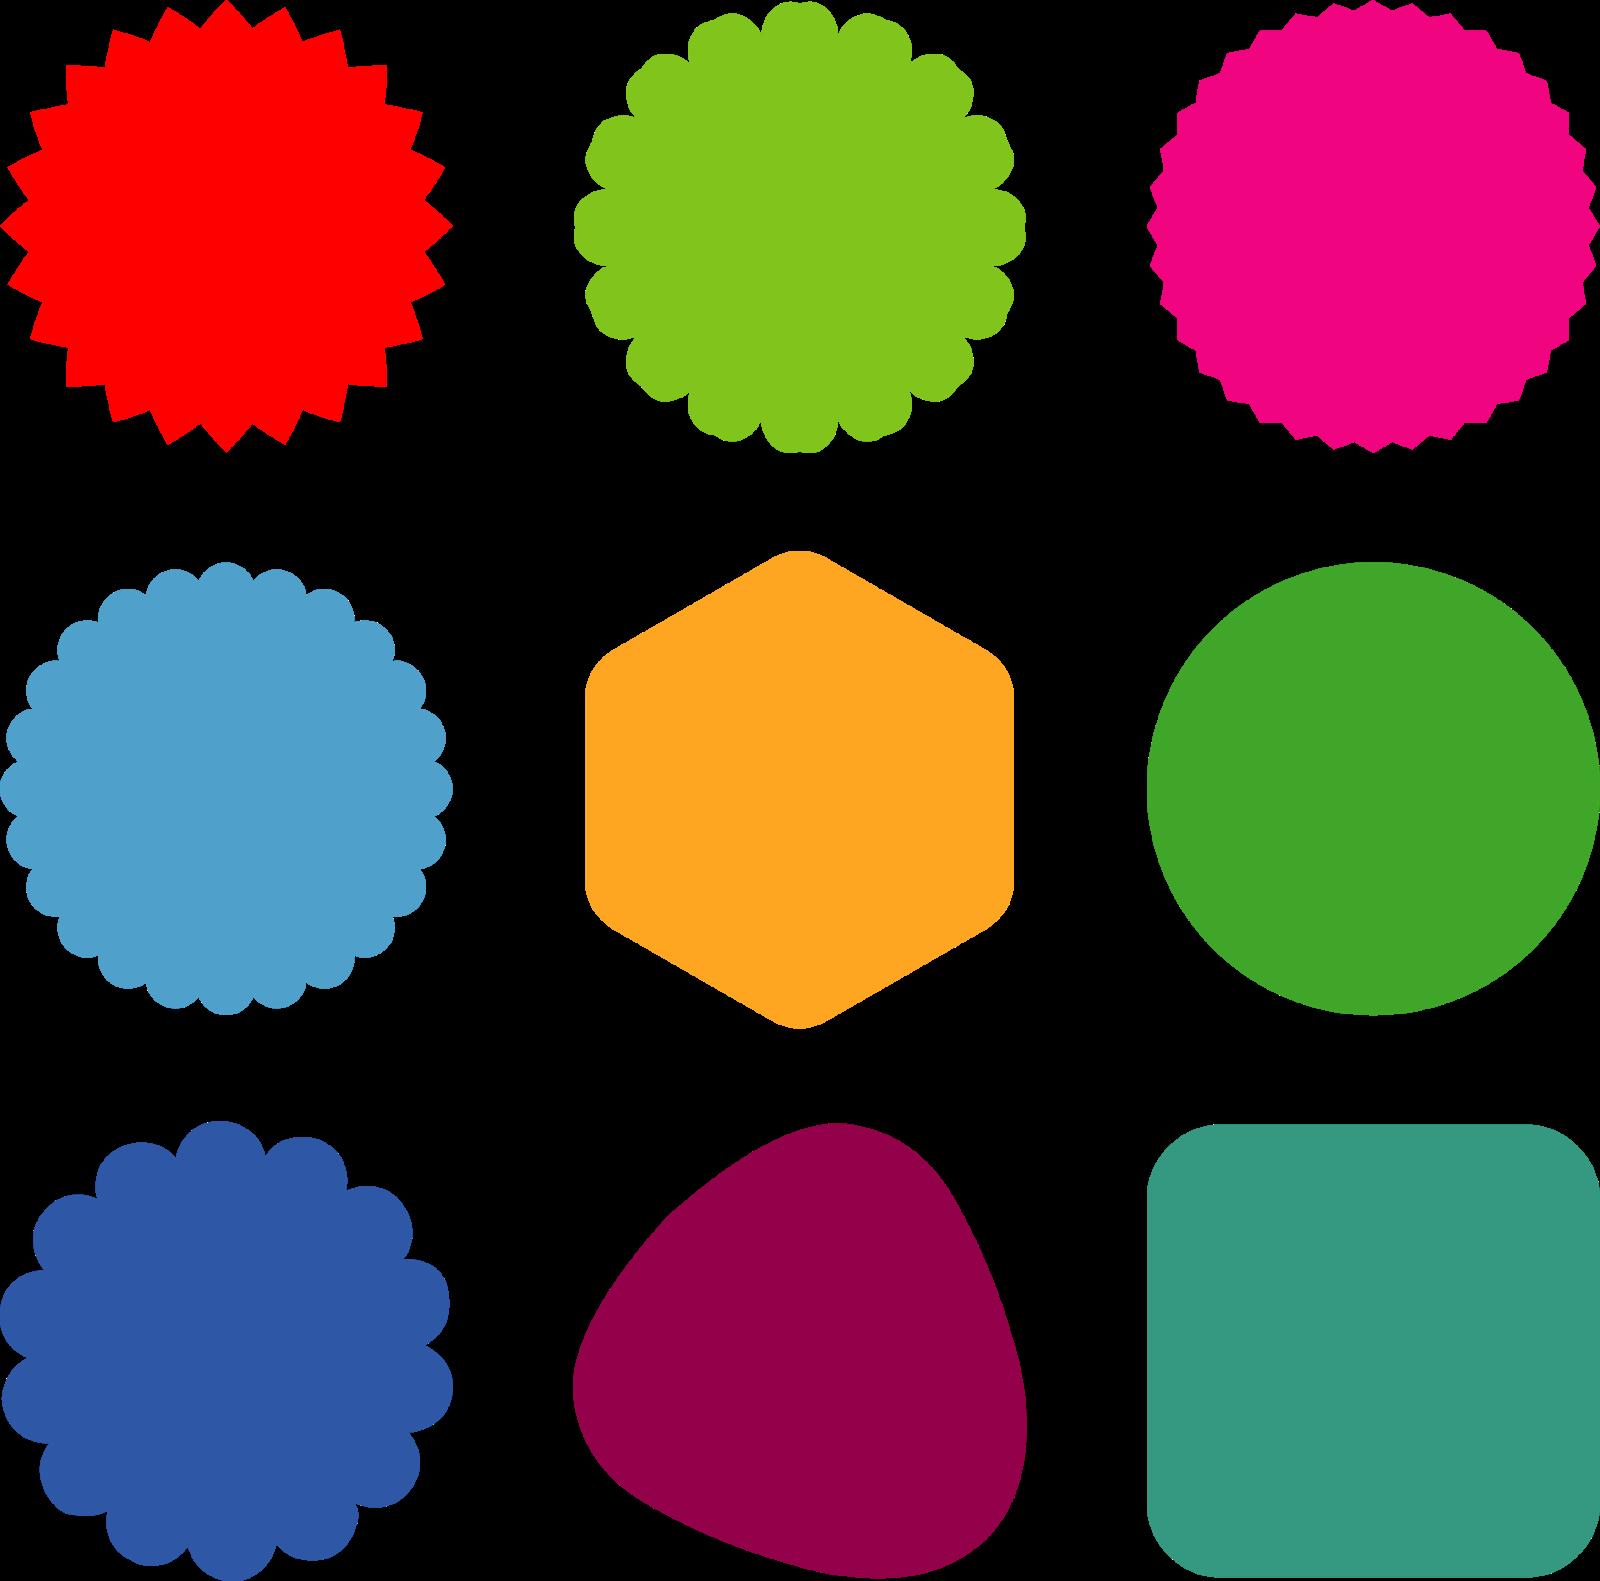 download icons color shapes svg eps png psd ai vectors.